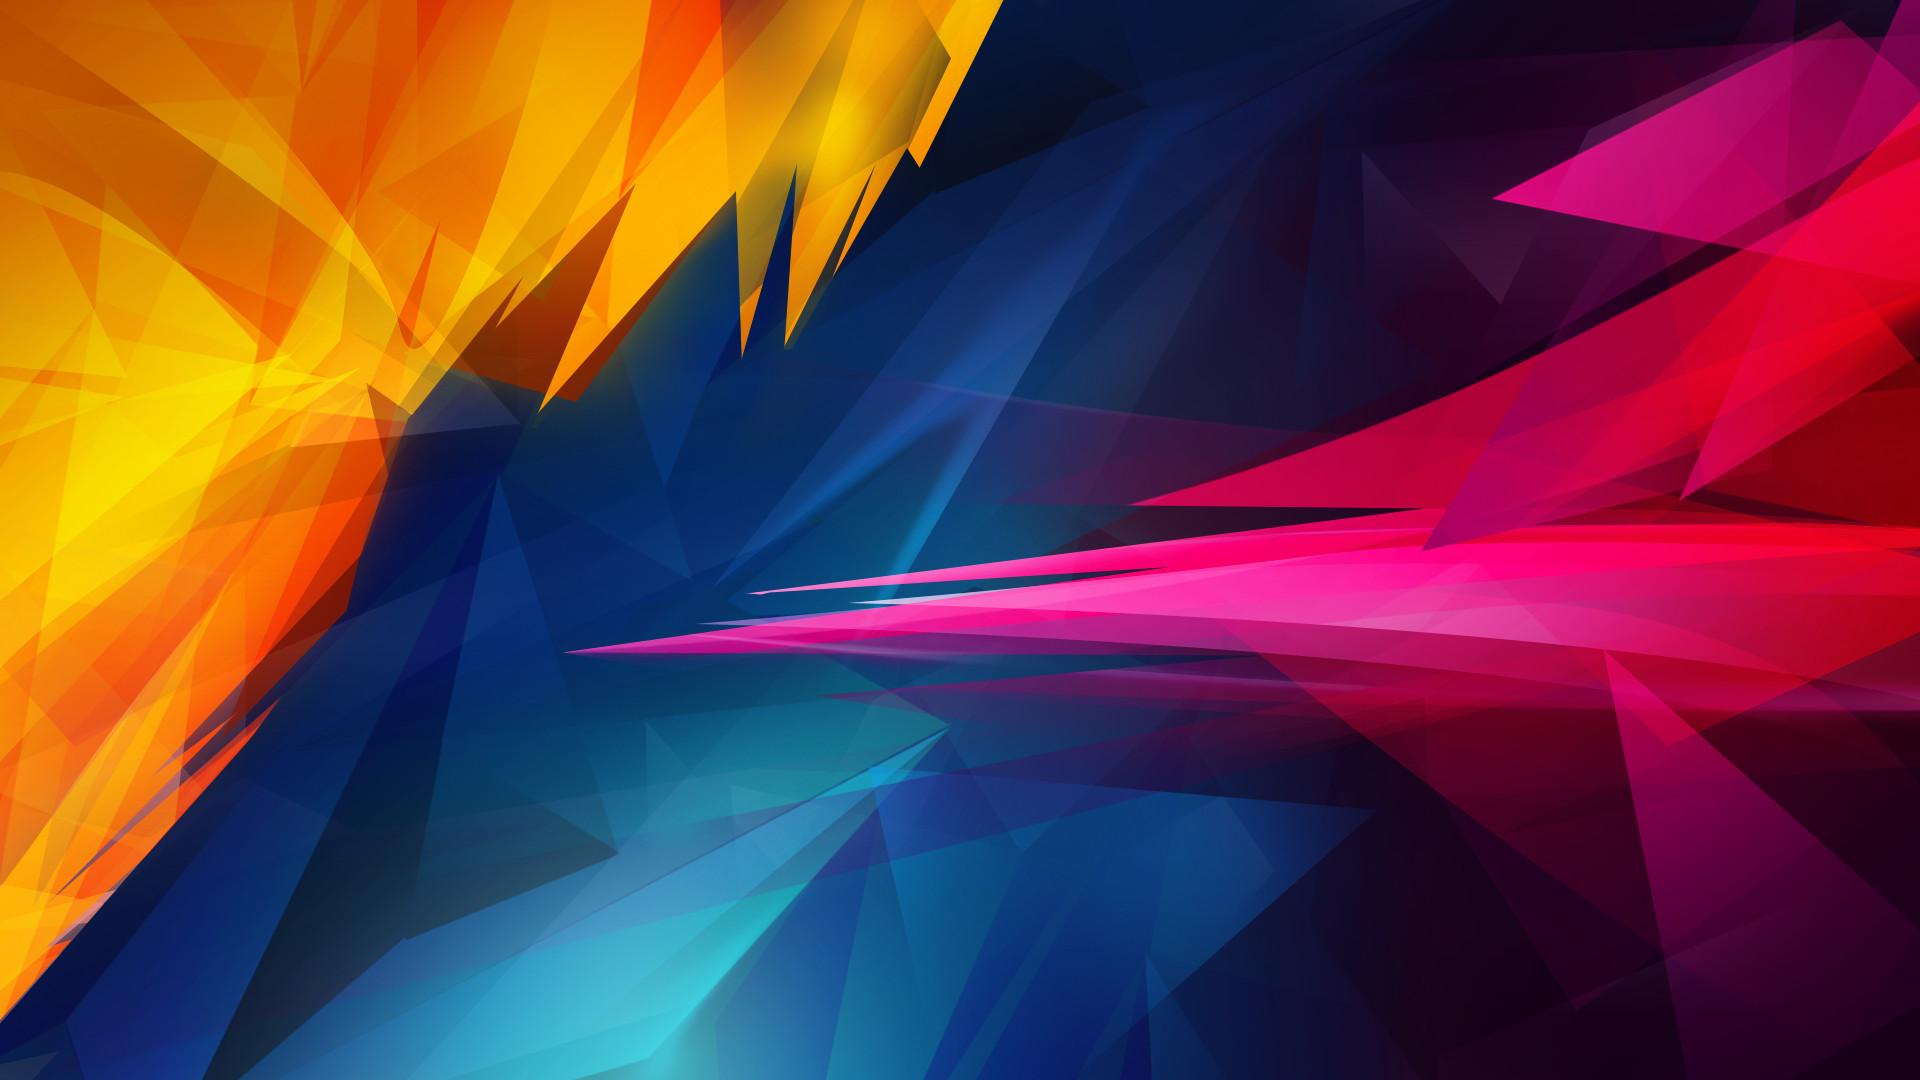 3D Abstract Desktop Wallpaper (65+ Images